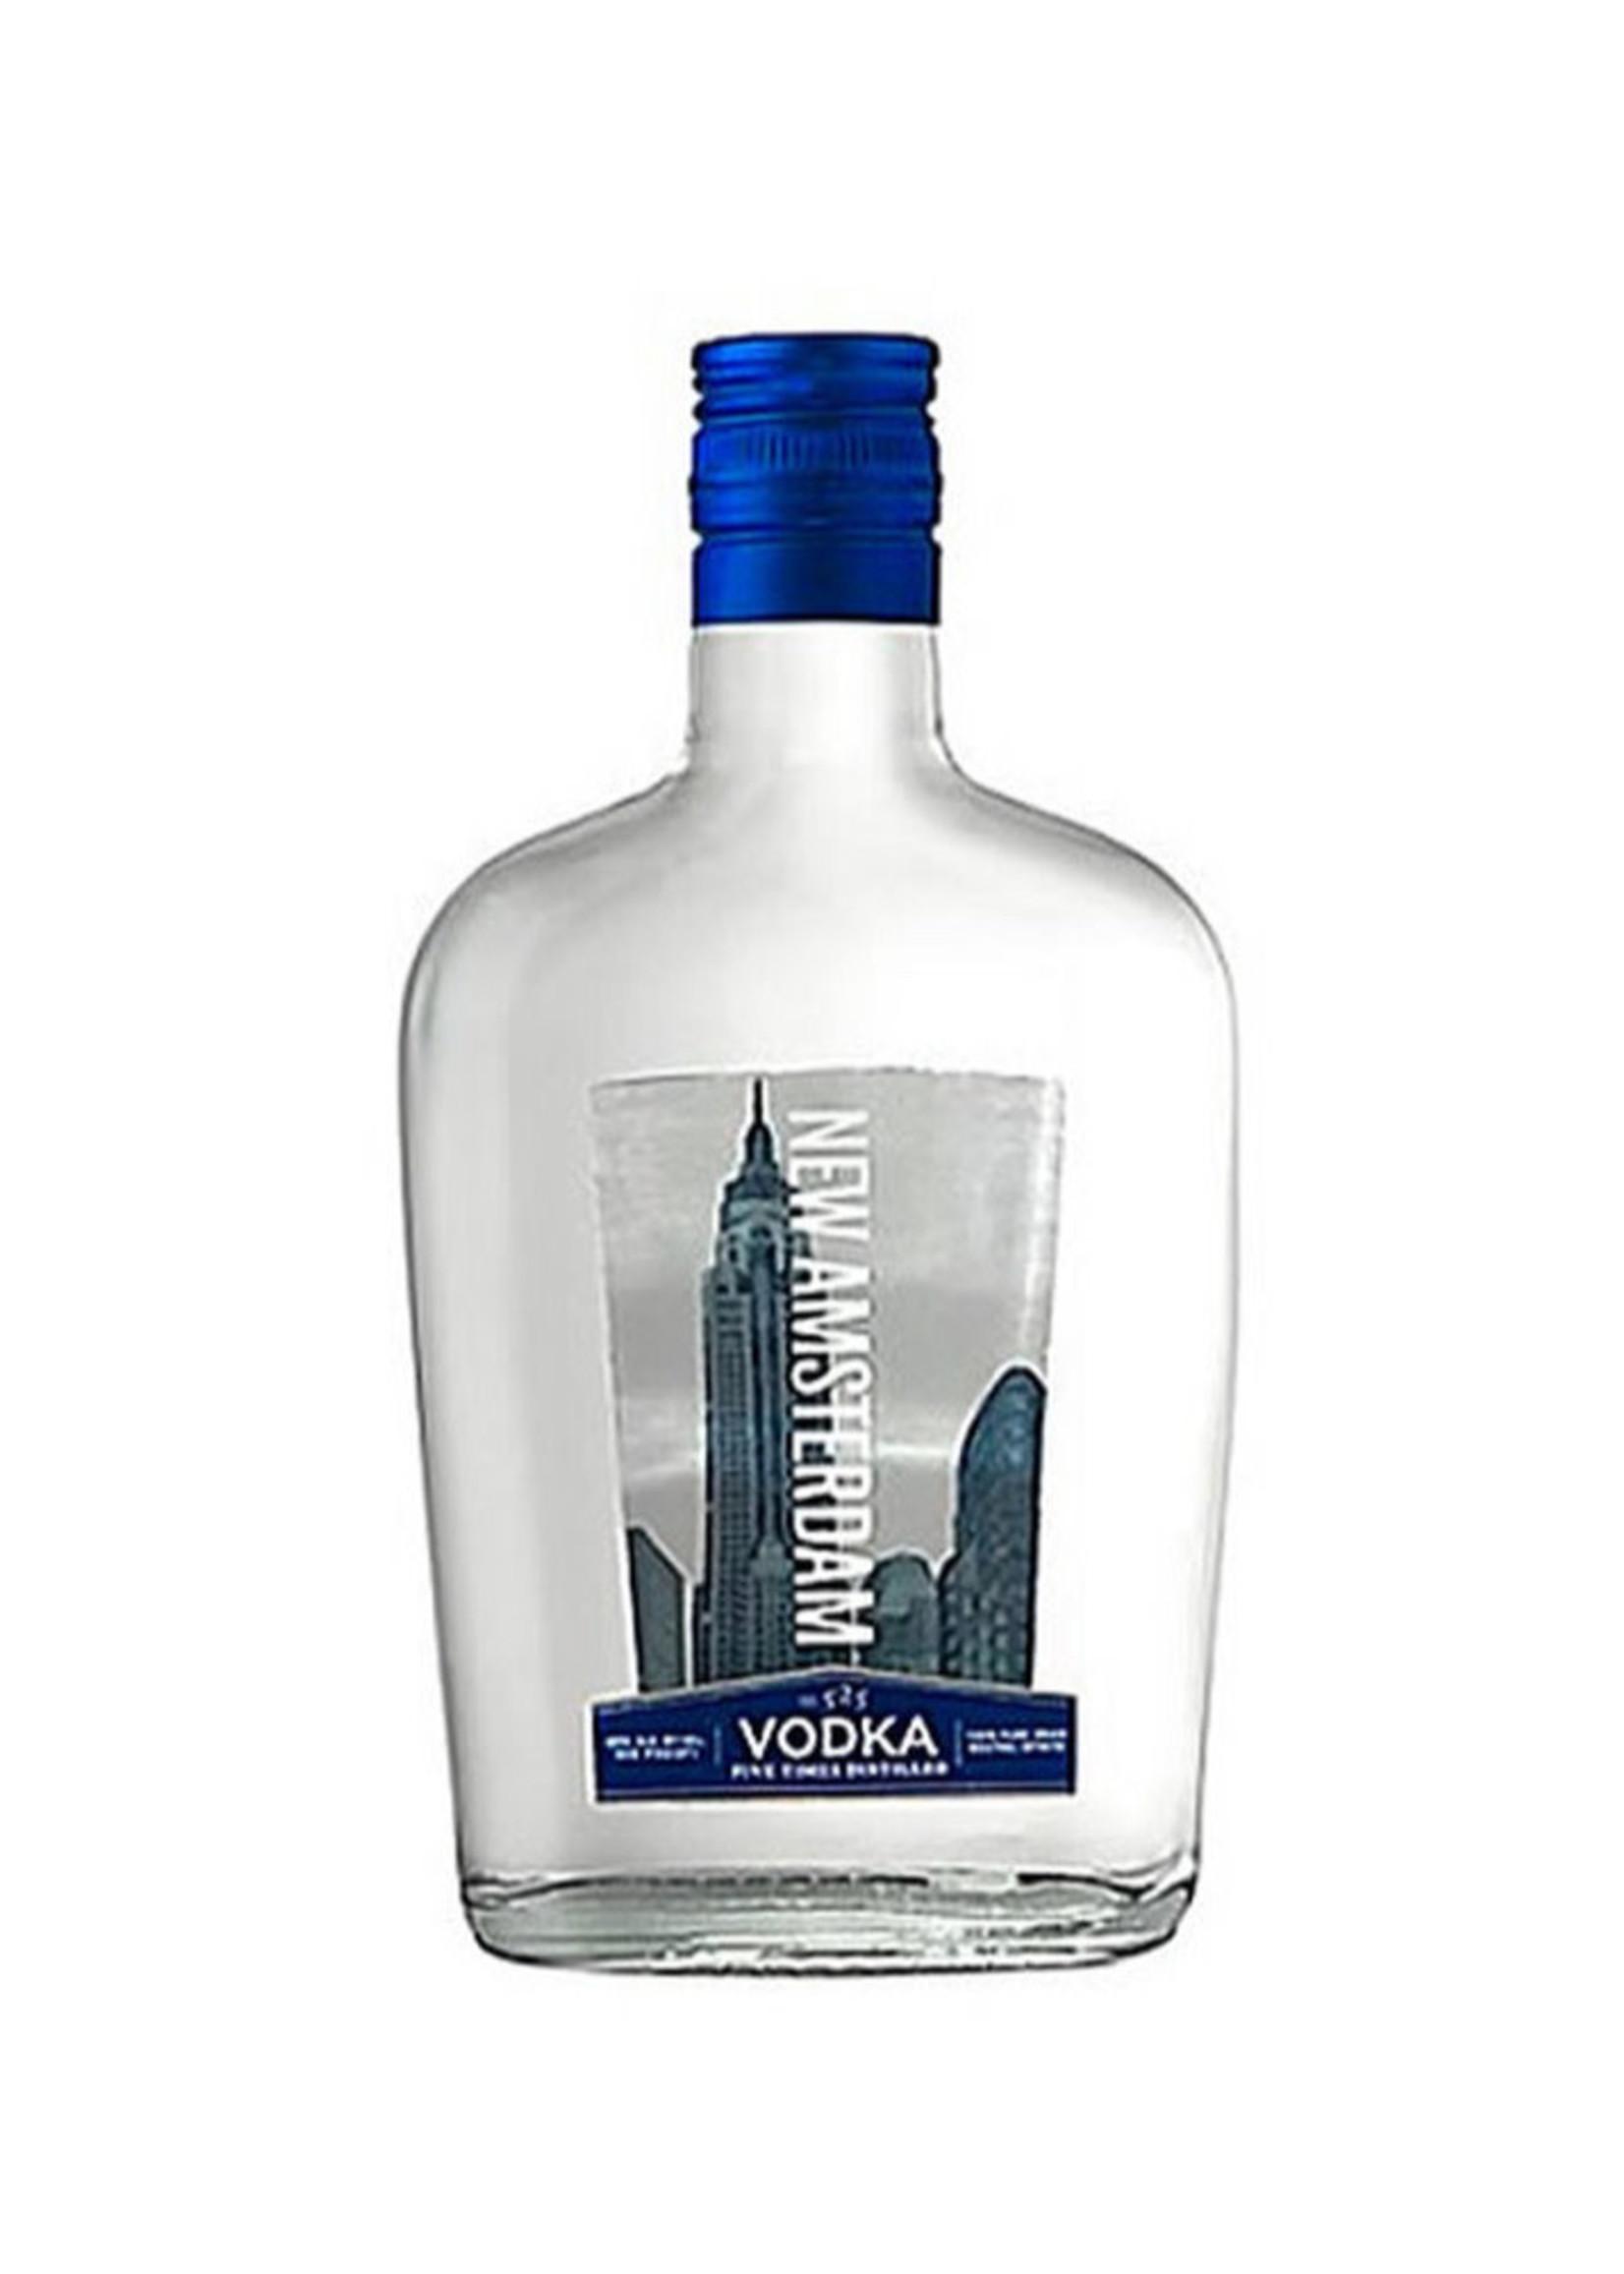 New Amsterdam Vodka 80 proof 375ml